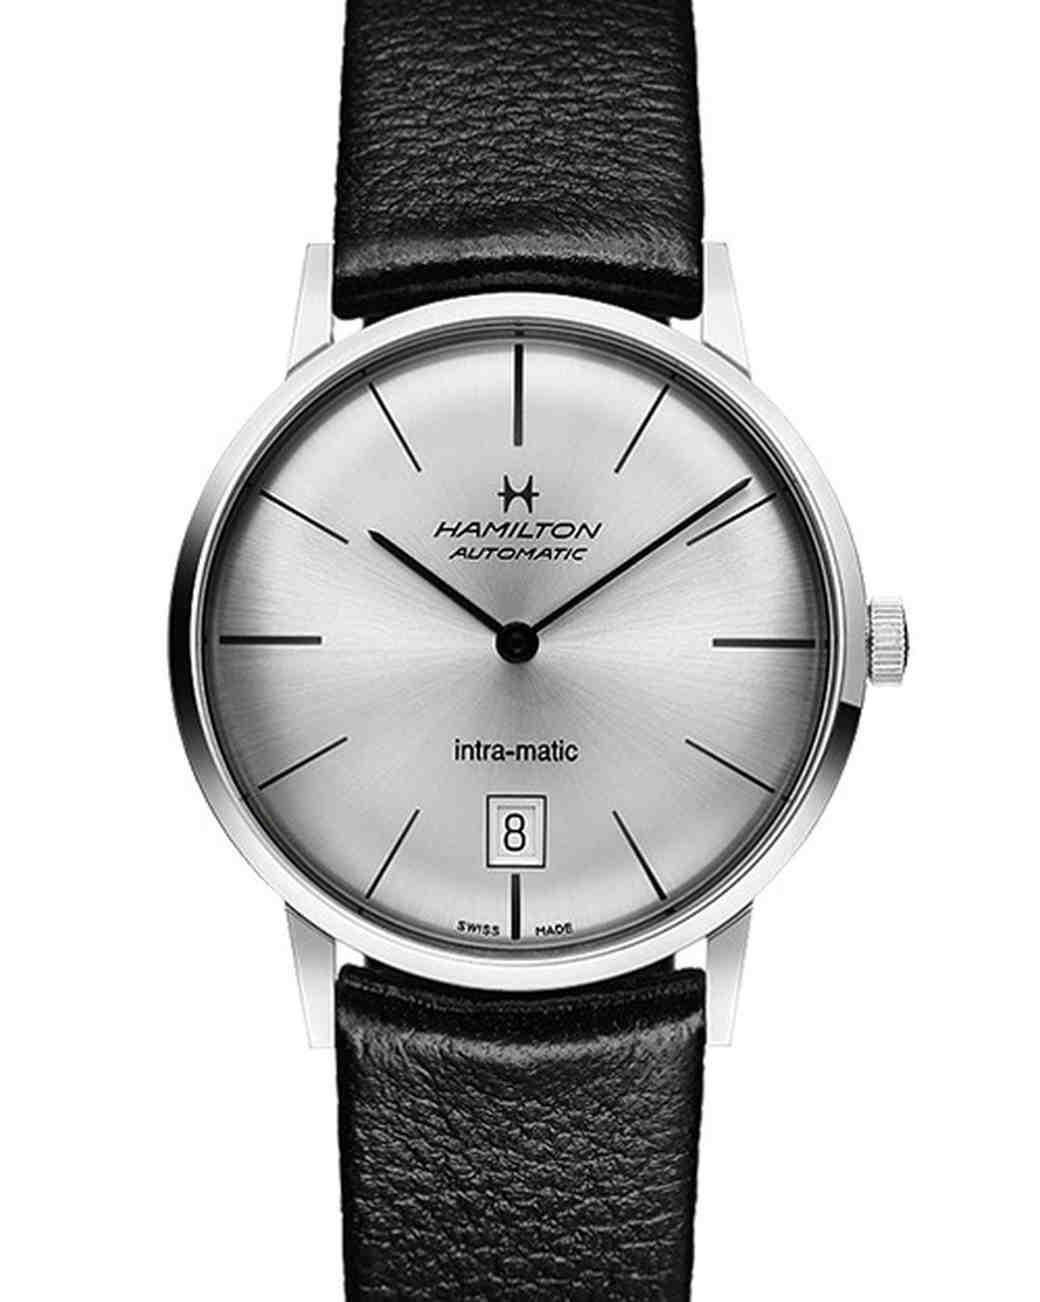 Hamilton Intra-Matic Auto Watch in Black Leather